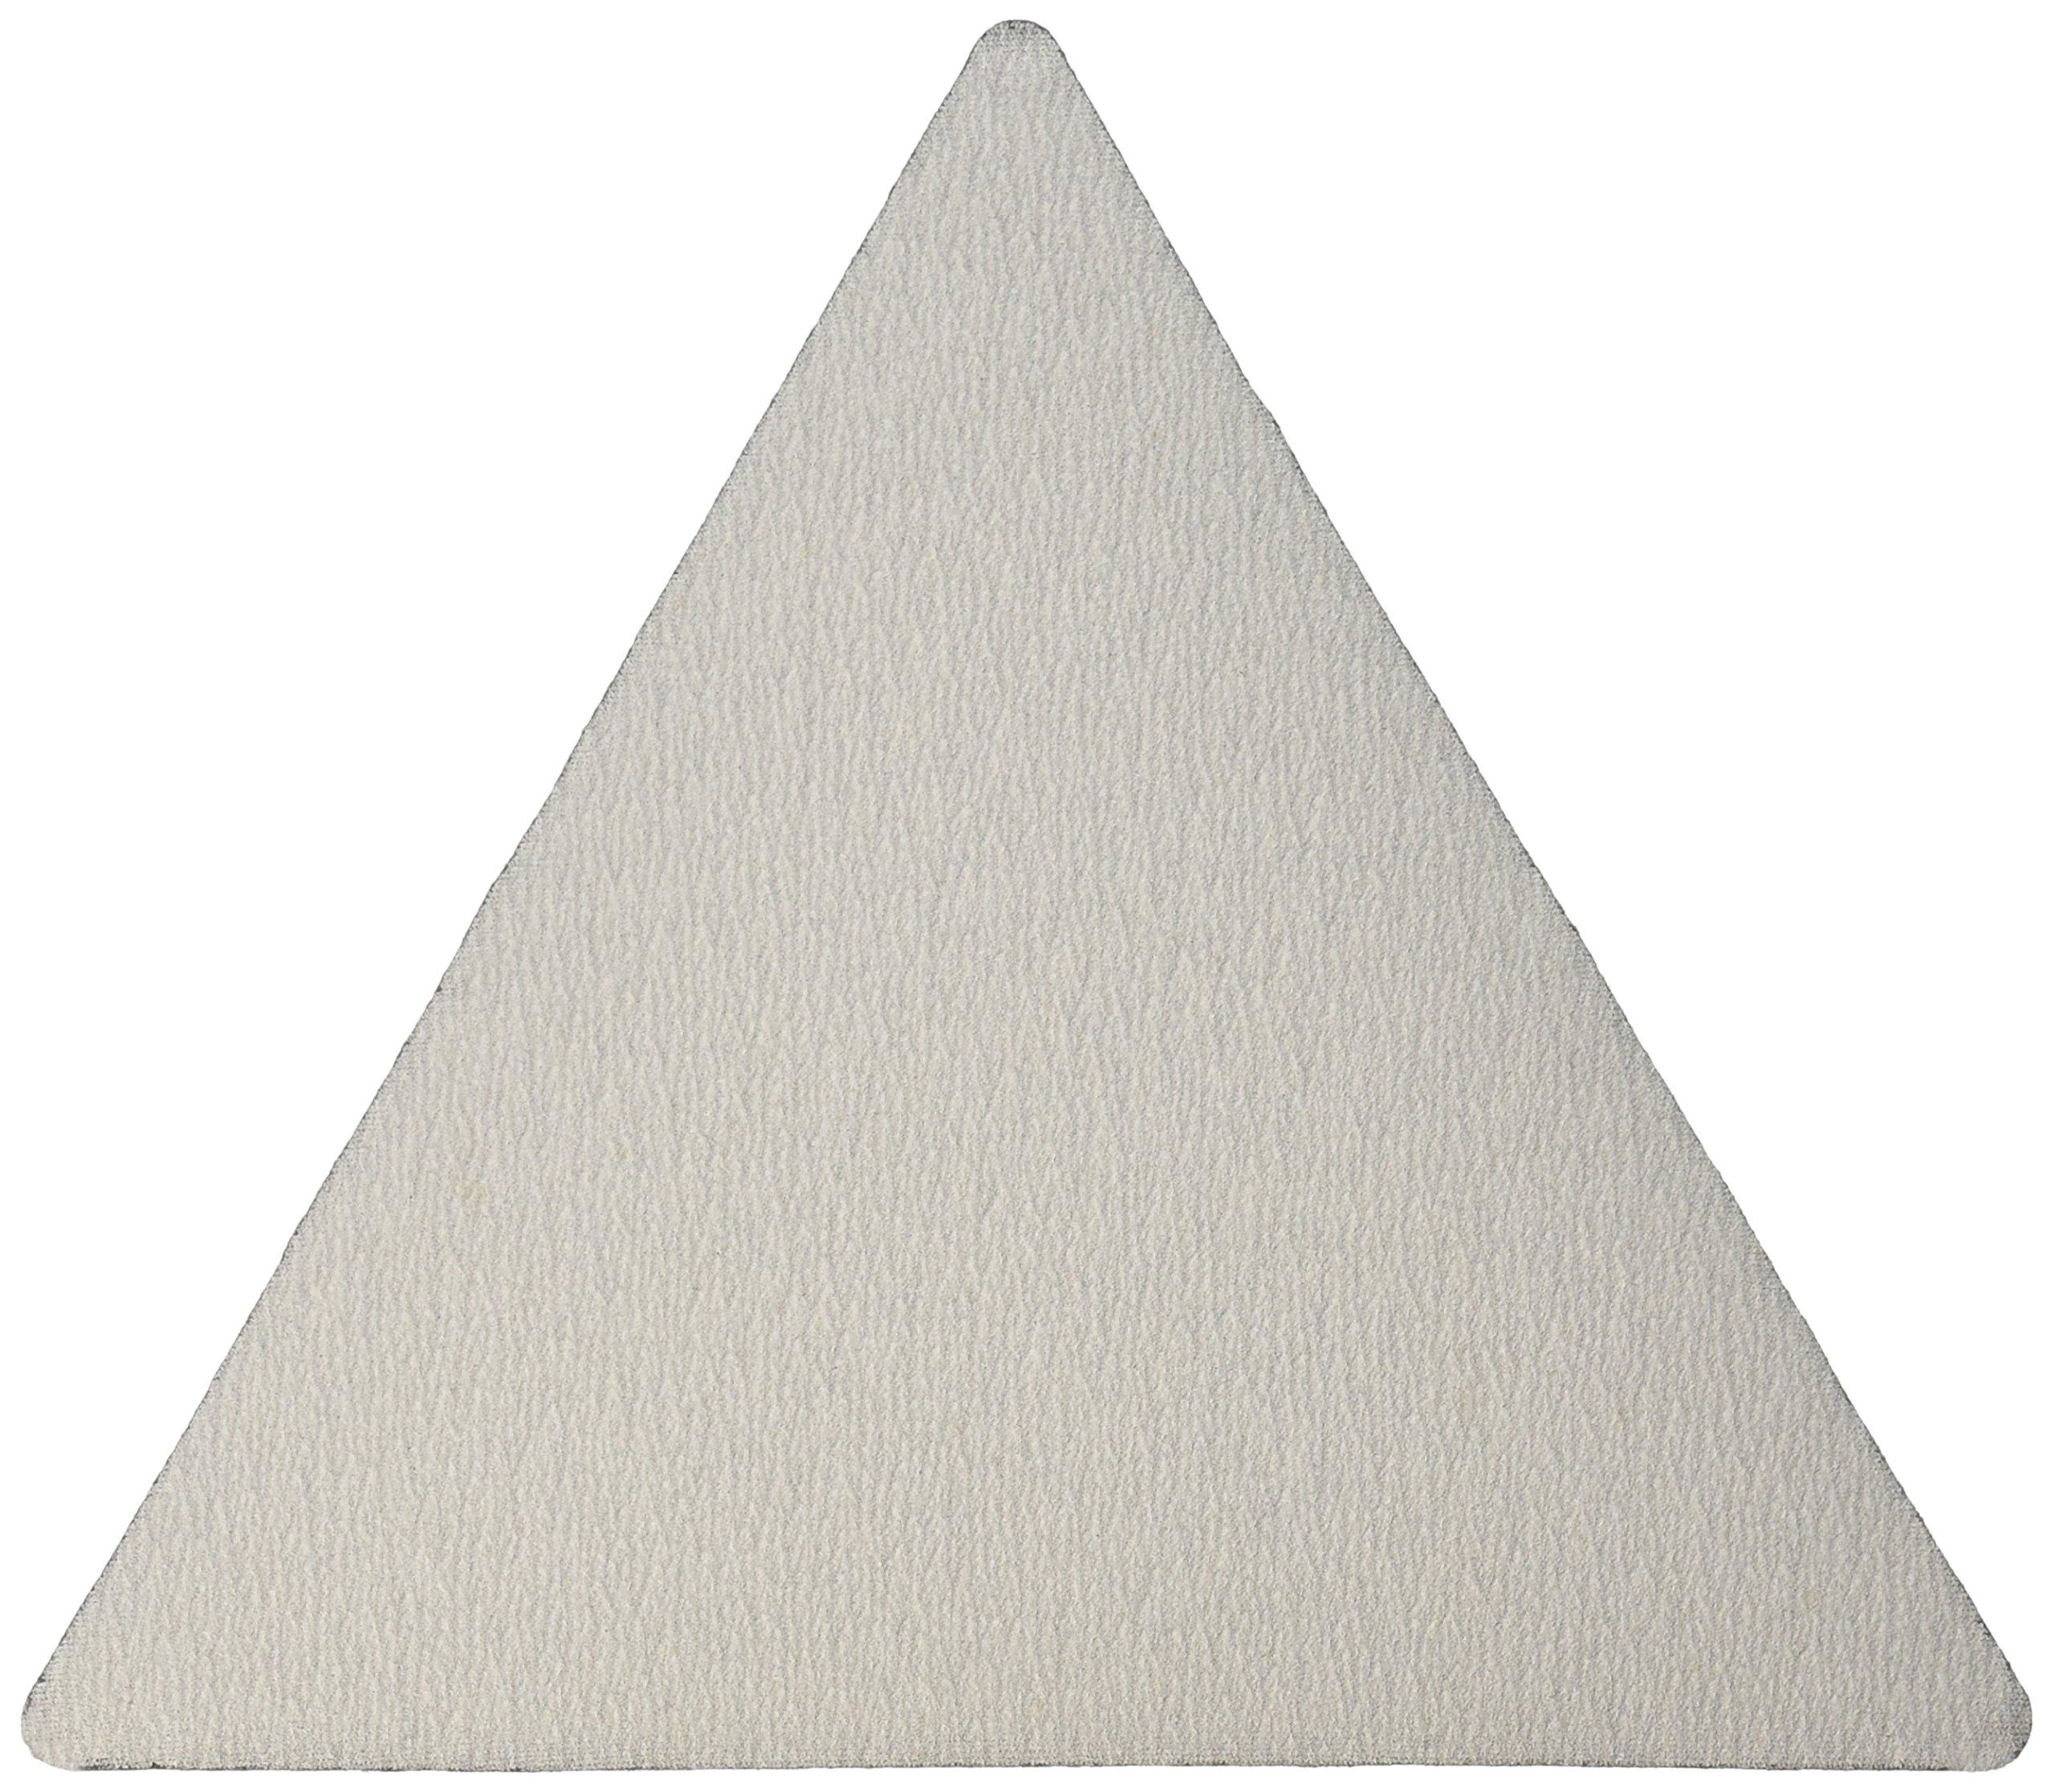 Full Circle International Inc. TG150 Level180 Sandpaper  Triangles 150 Grit 5-Pack by Full Circle International